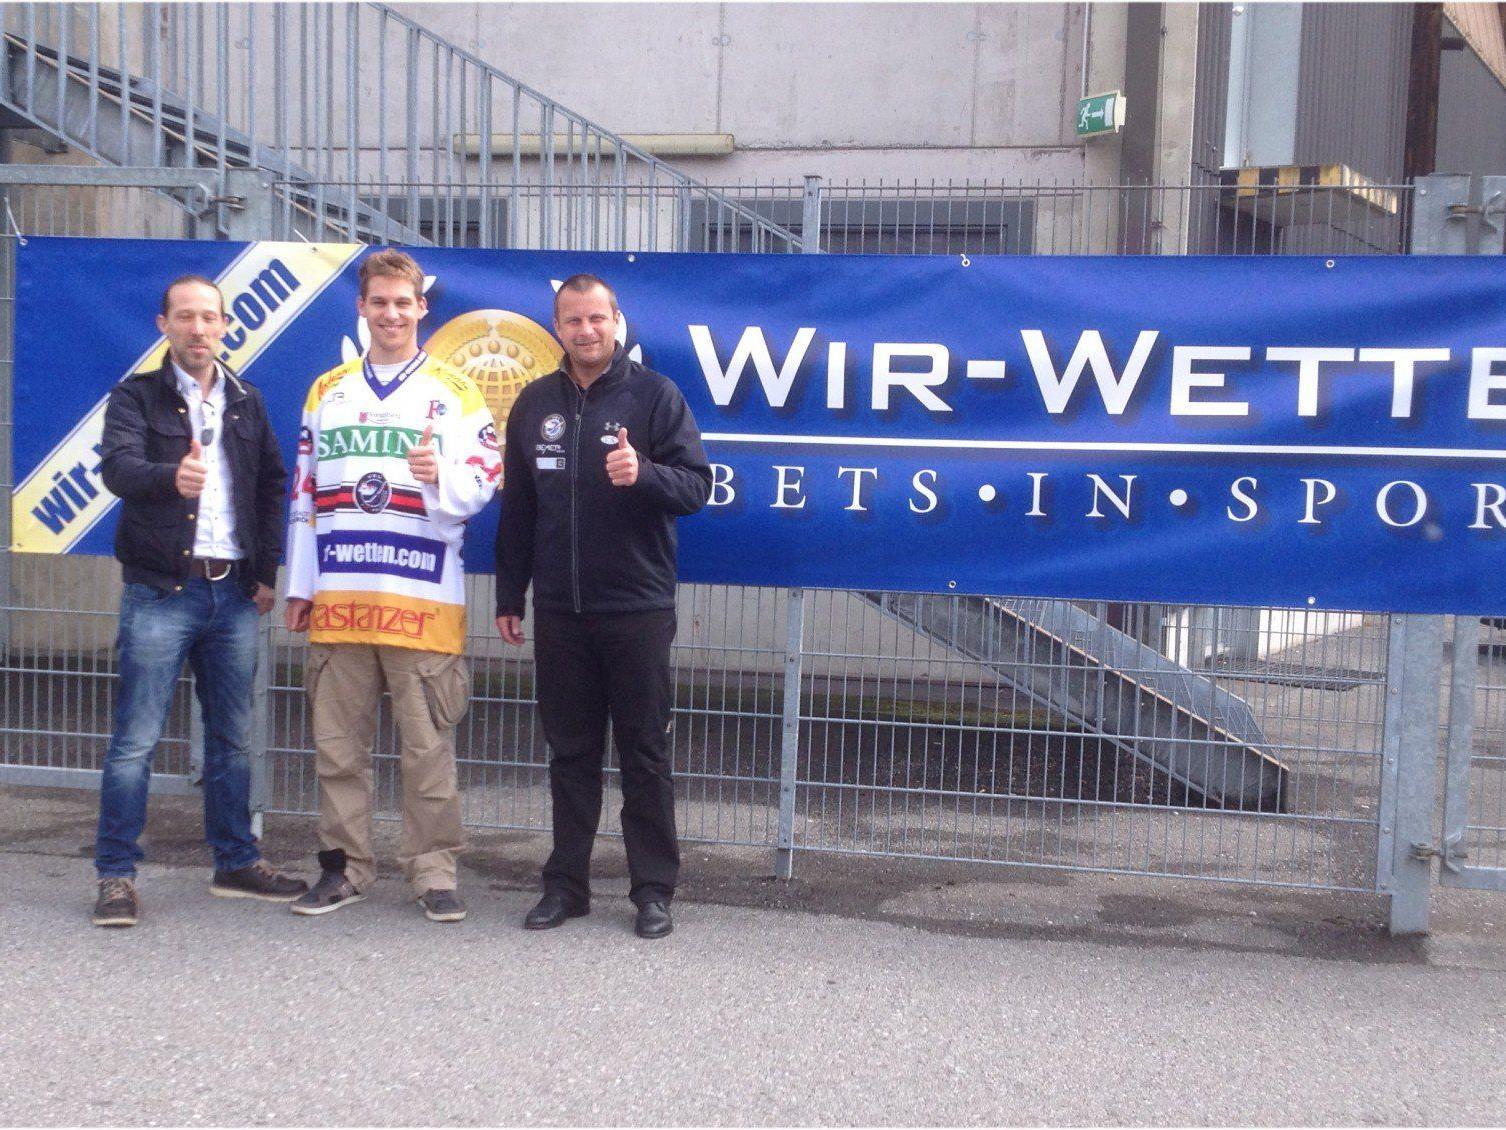 VEU Feldkirch Geschäftsführer Michael Lampert mit dem neuen Sponsor und VEU-Spieler Draschkowitz.